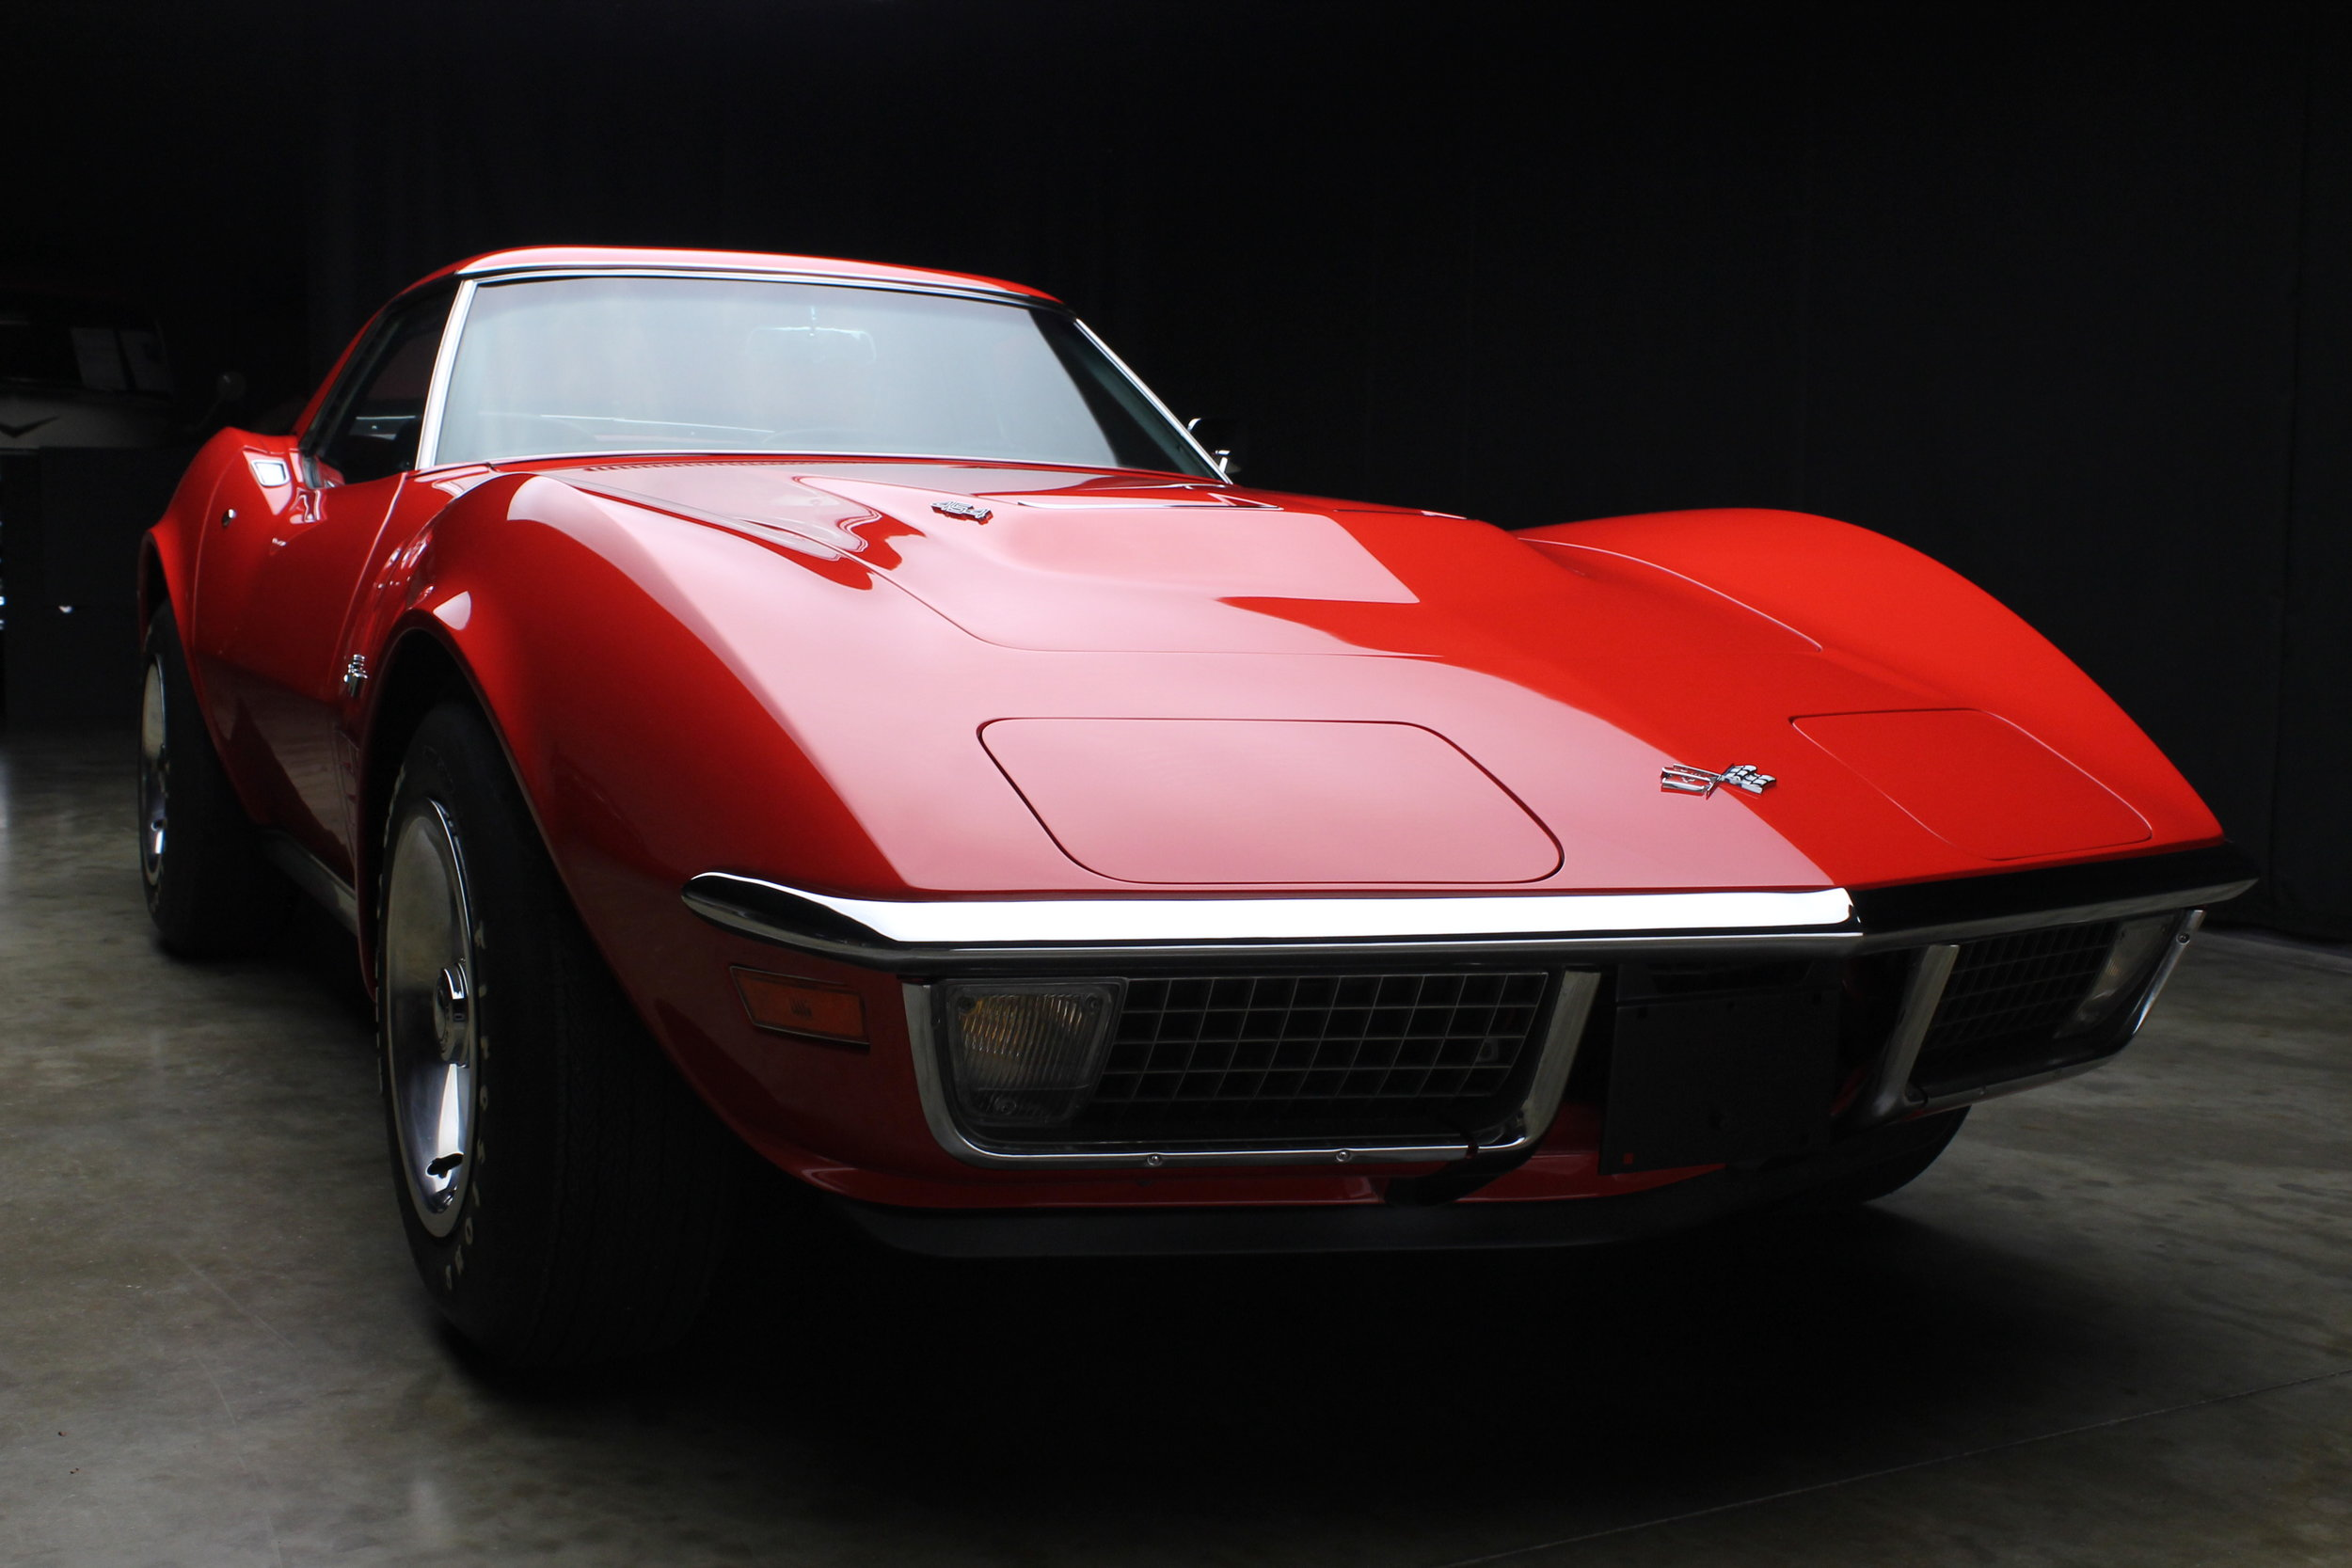 County Corvette Classic Cars